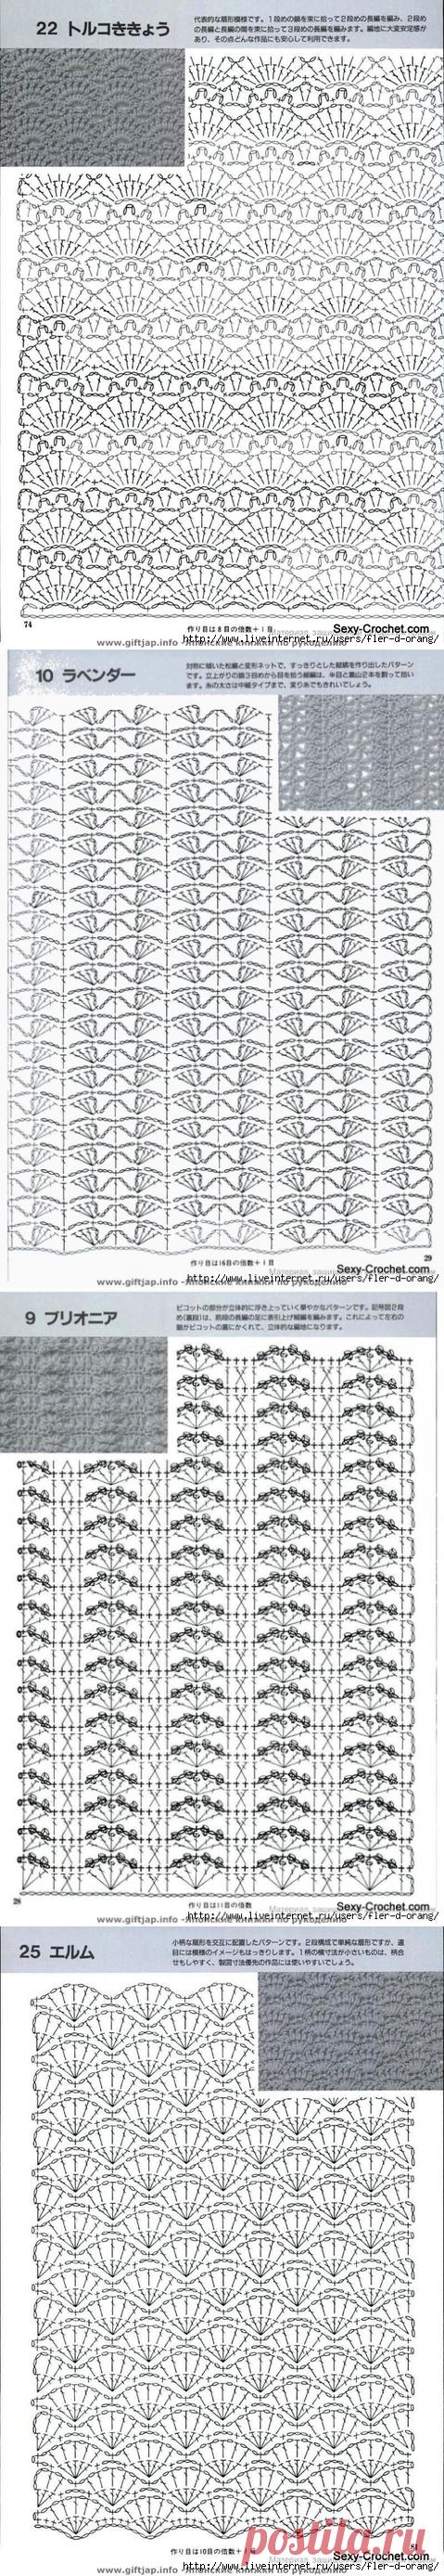 Схемы для юбок крючком - 1